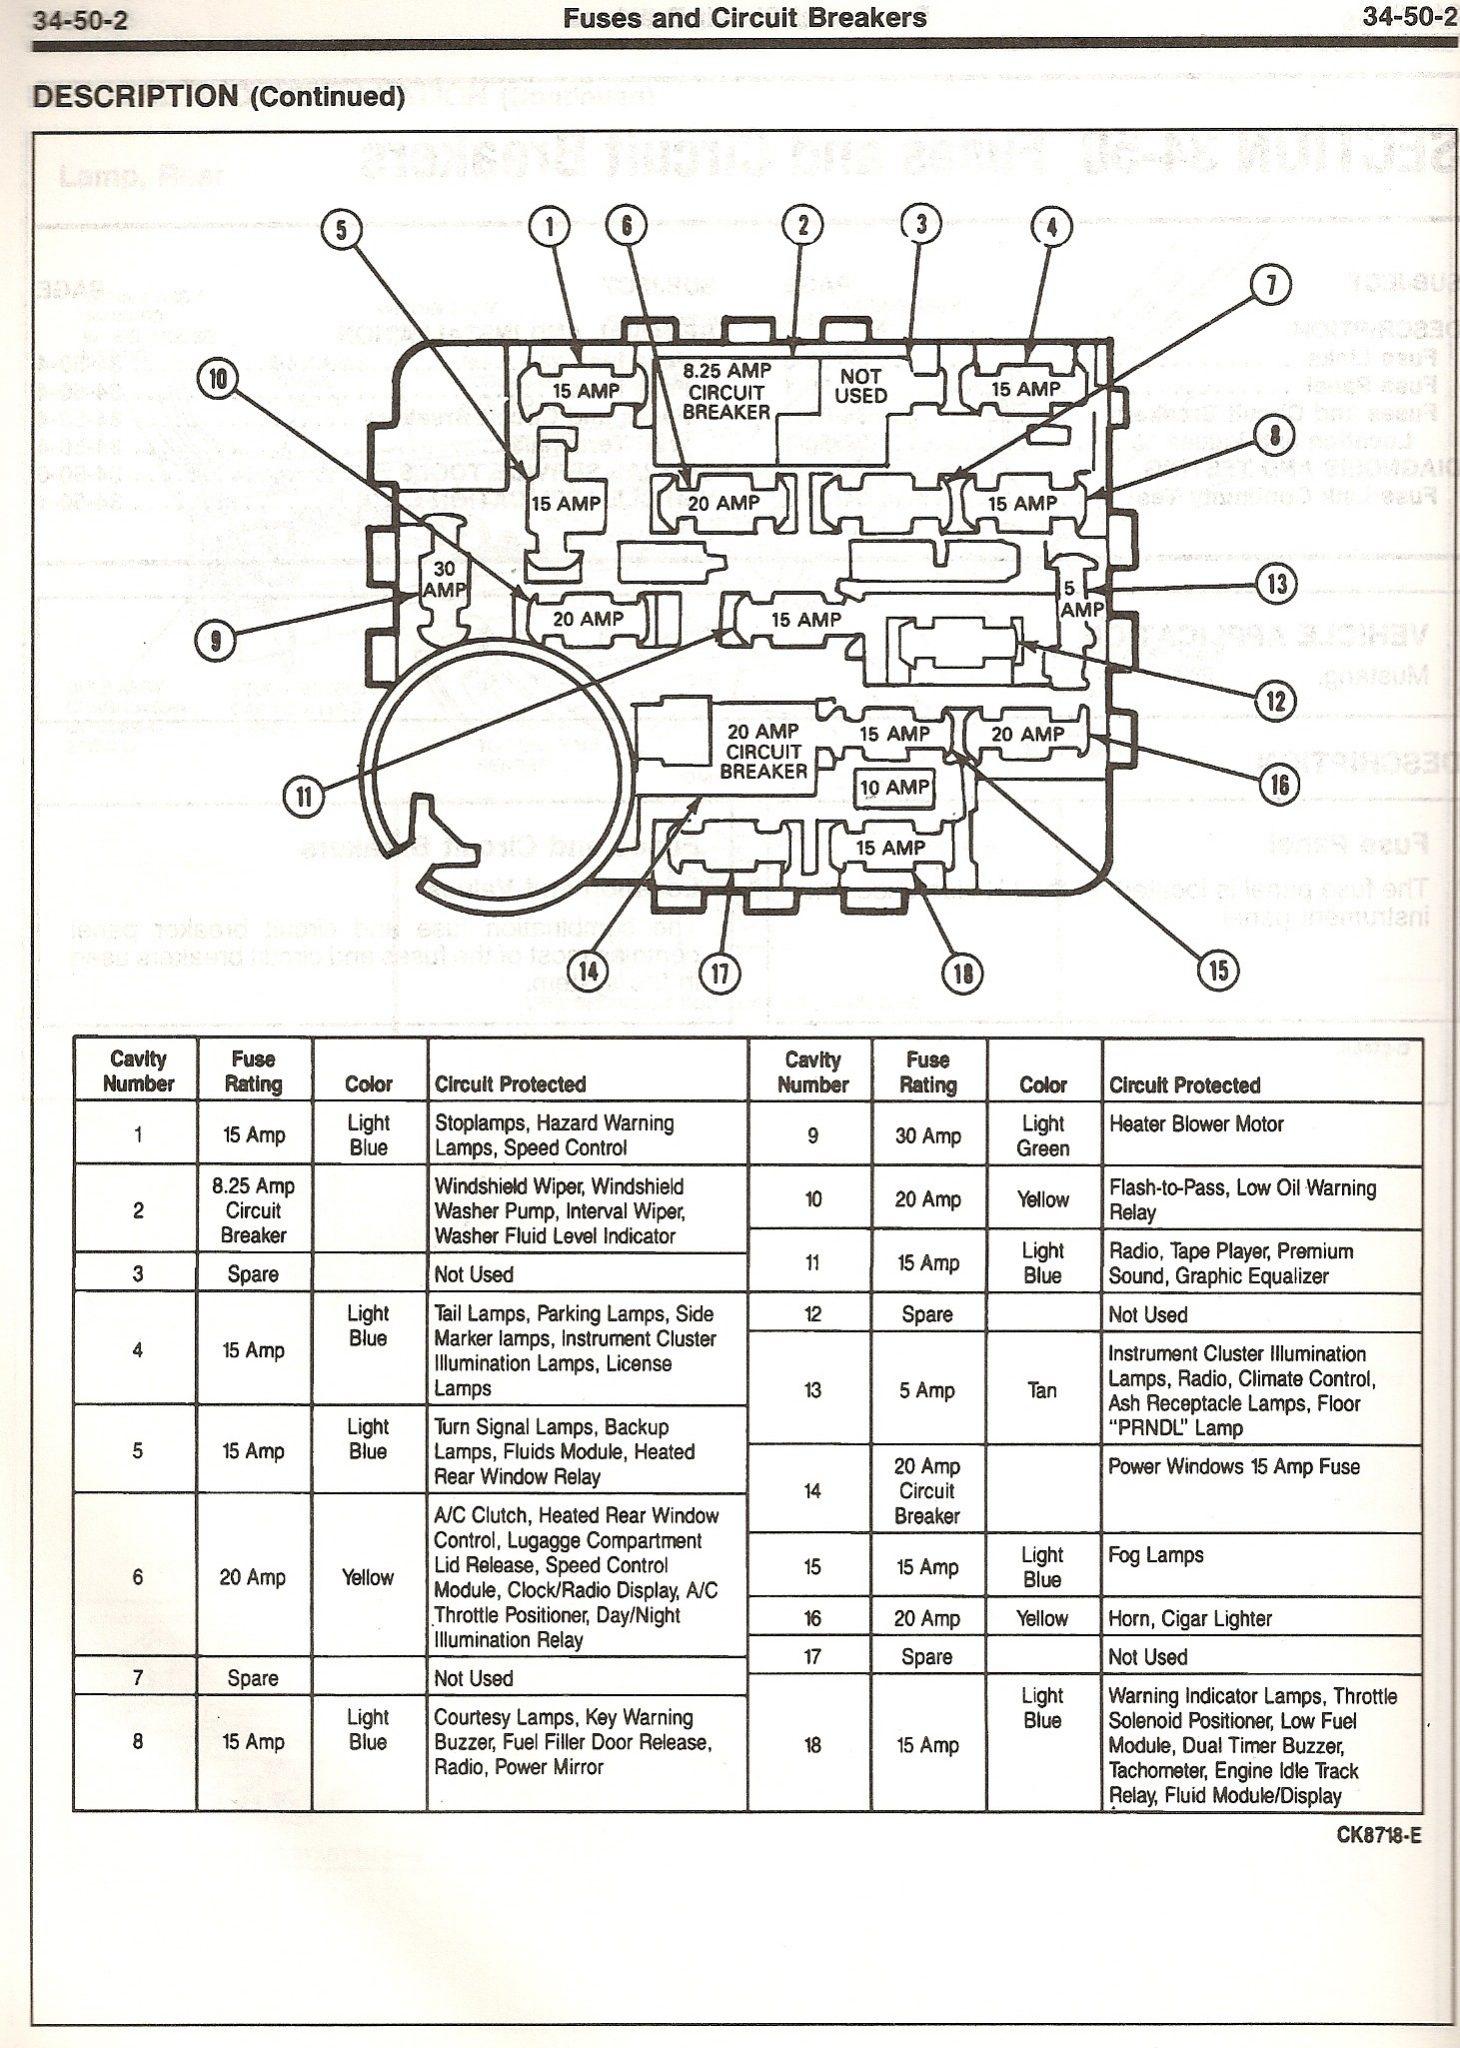 91 Ford E 150 Fuse Box Diagram - Wiring Diagram Networks